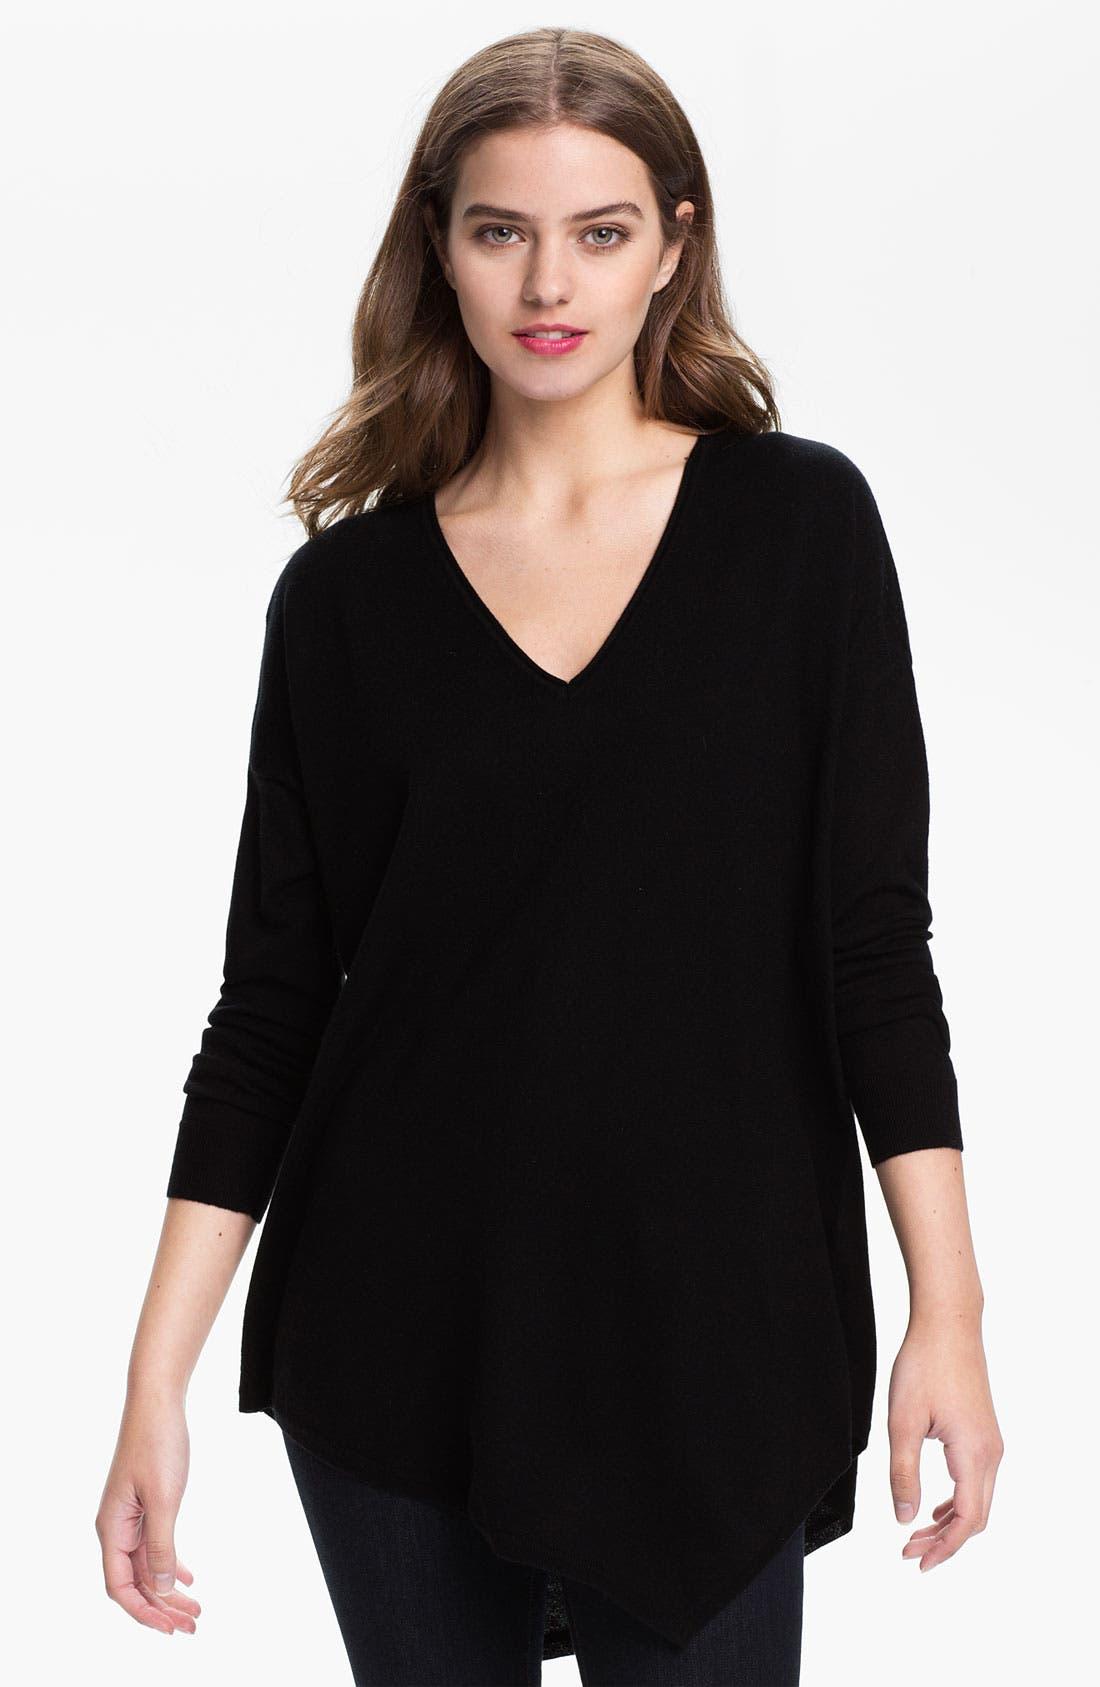 Alternate Image 1 Selected - Joie 'Armelio' Asymmetrical Sweater